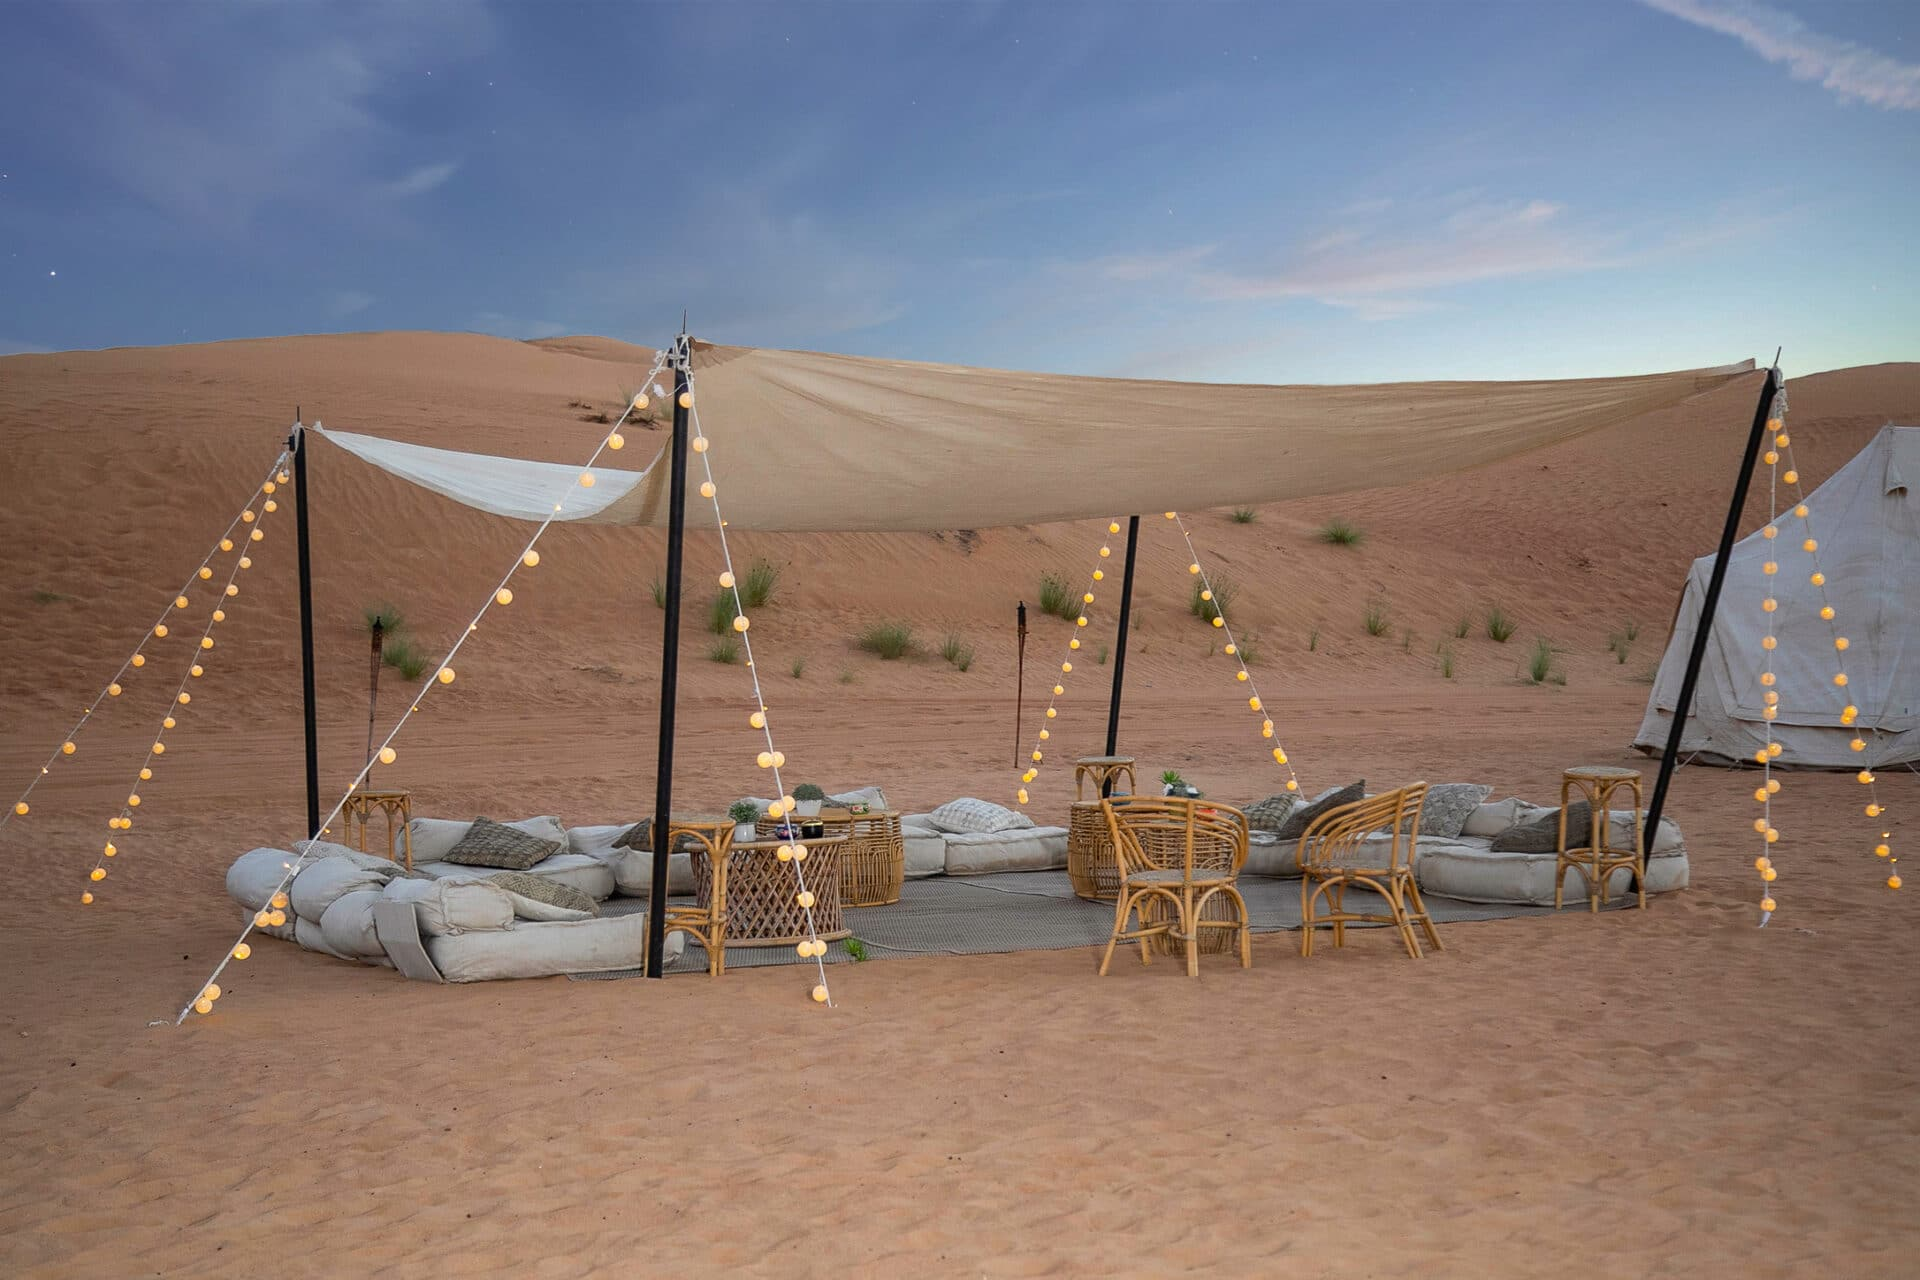 Nara Desert Escape - Dubai Desert